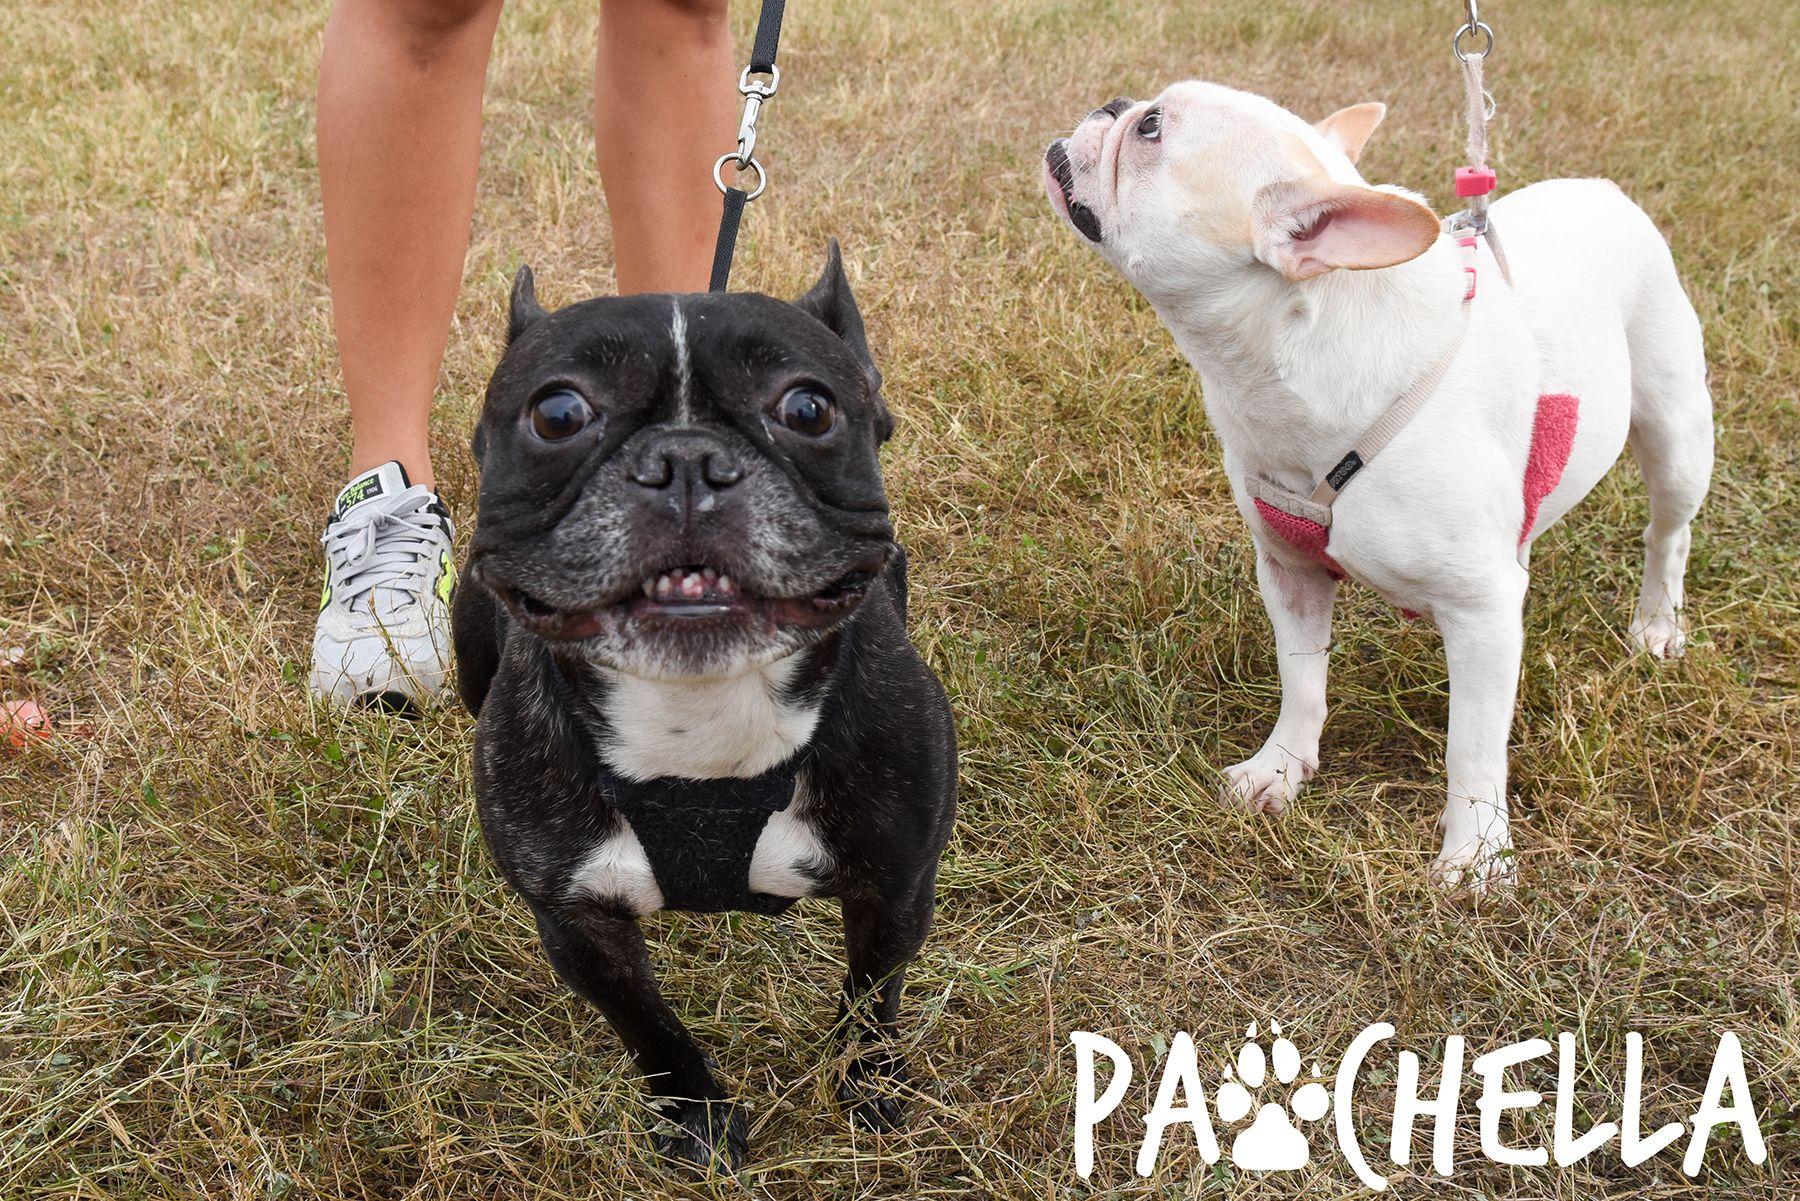 Pin by San Antonio Humane Society on Pawchella 2016